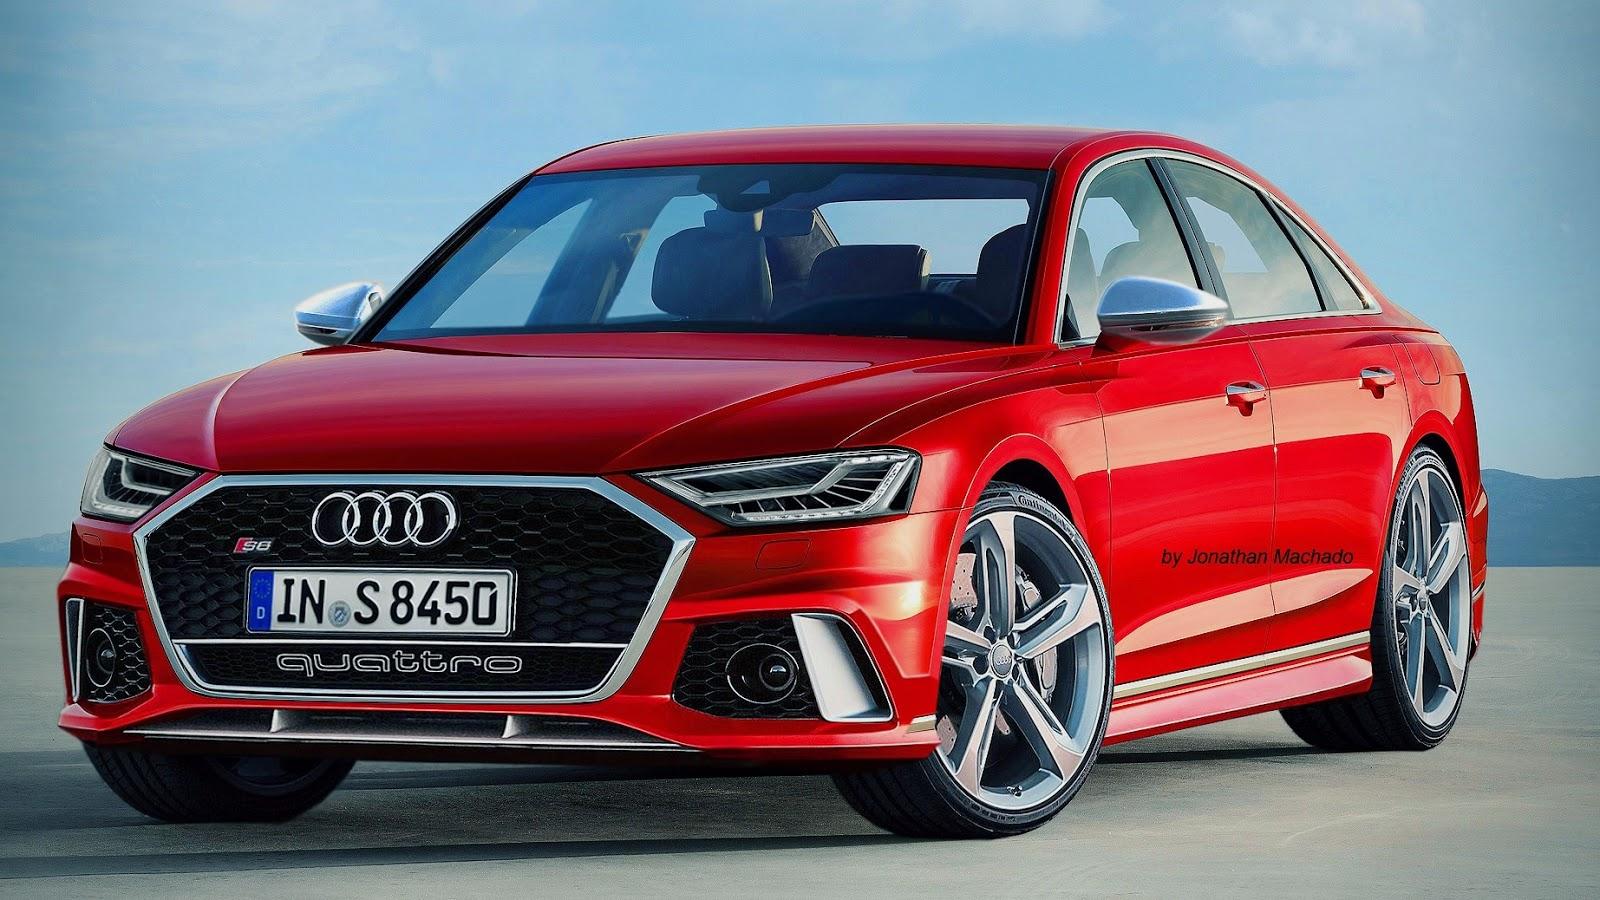 Photoshop All New 2019 Audi S8 Audis8 Carwp